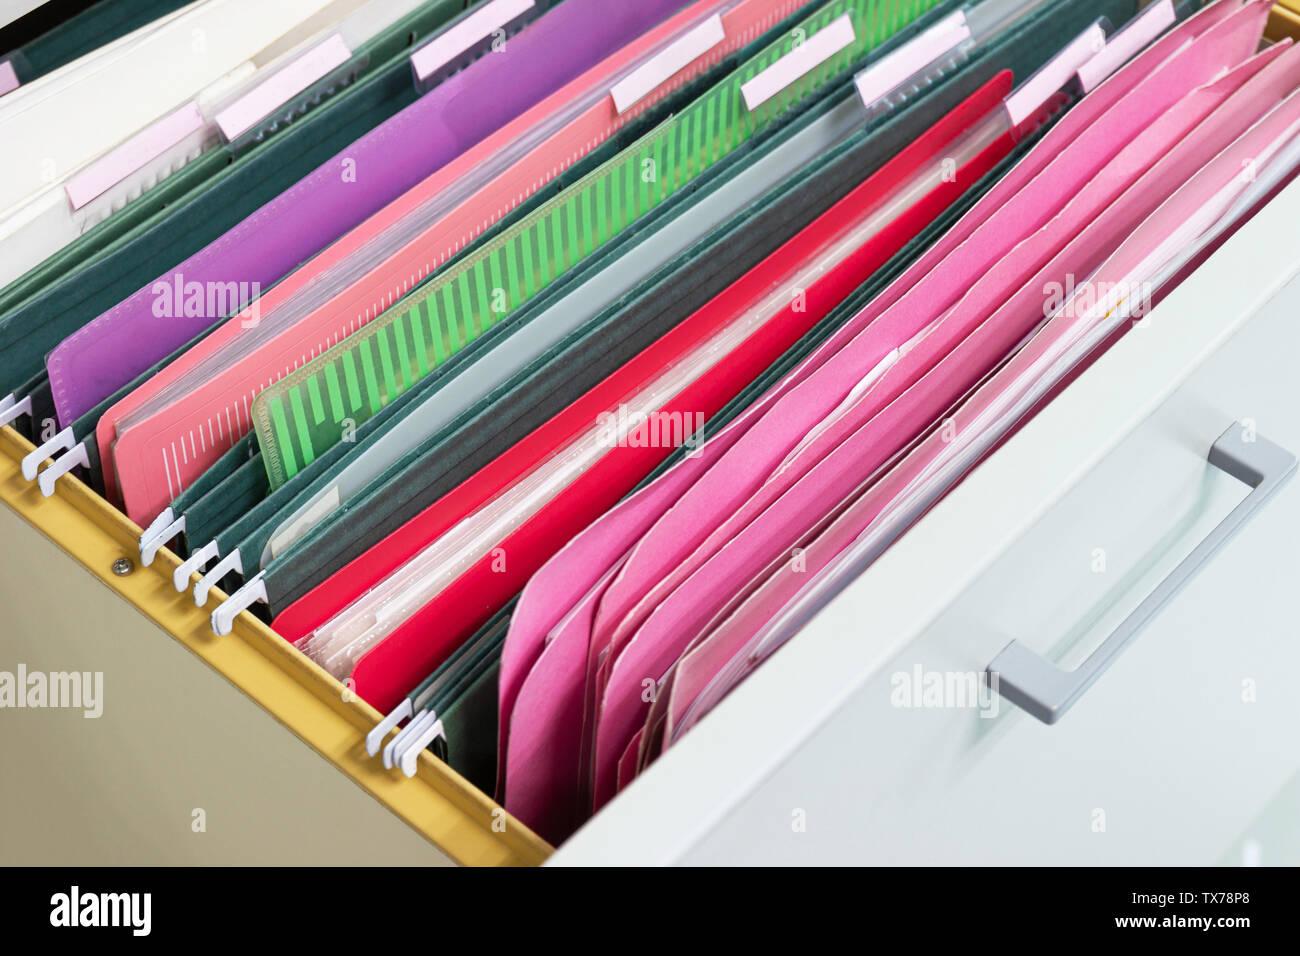 Hanging File Folders Stock Photos & Hanging File Folders